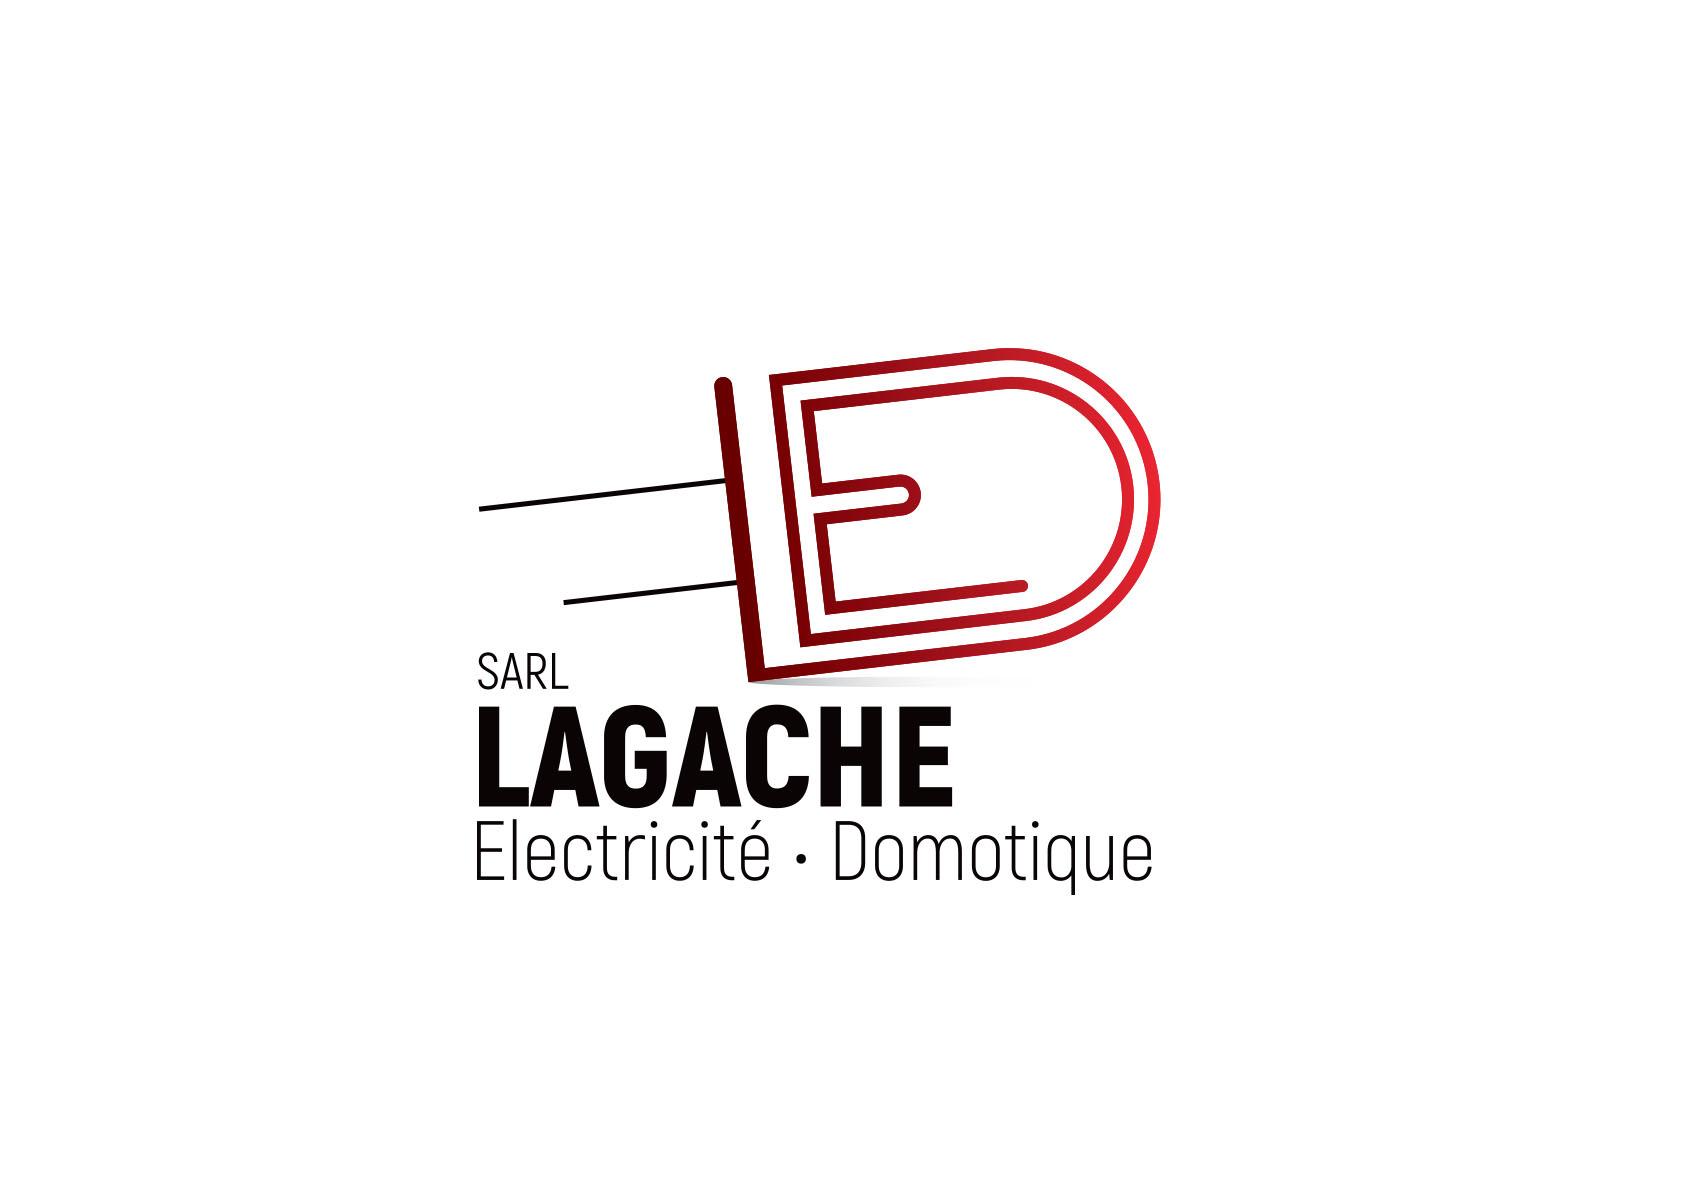 Lagache LED